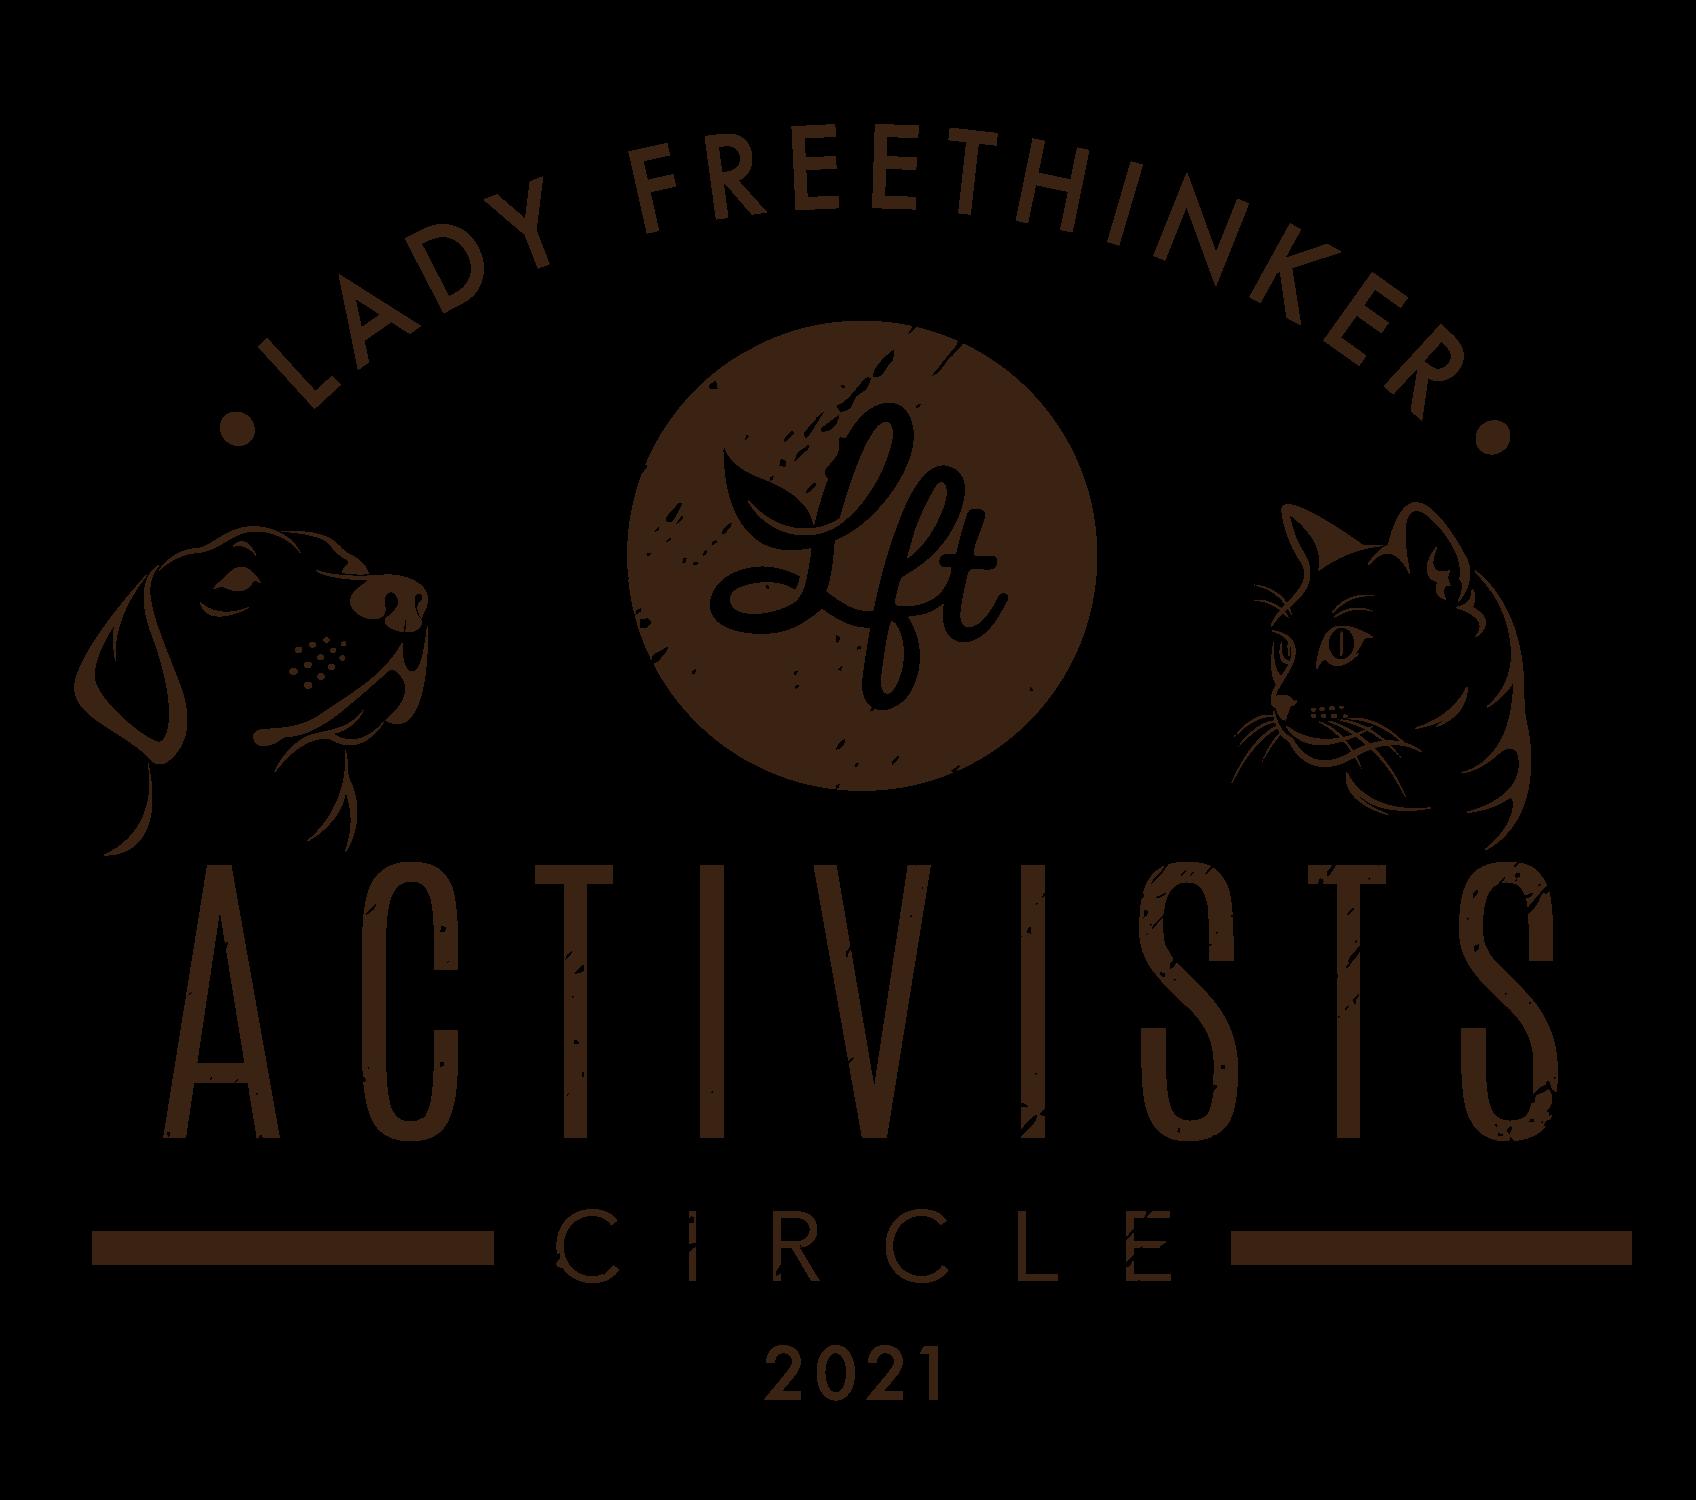 Activist Circle logo